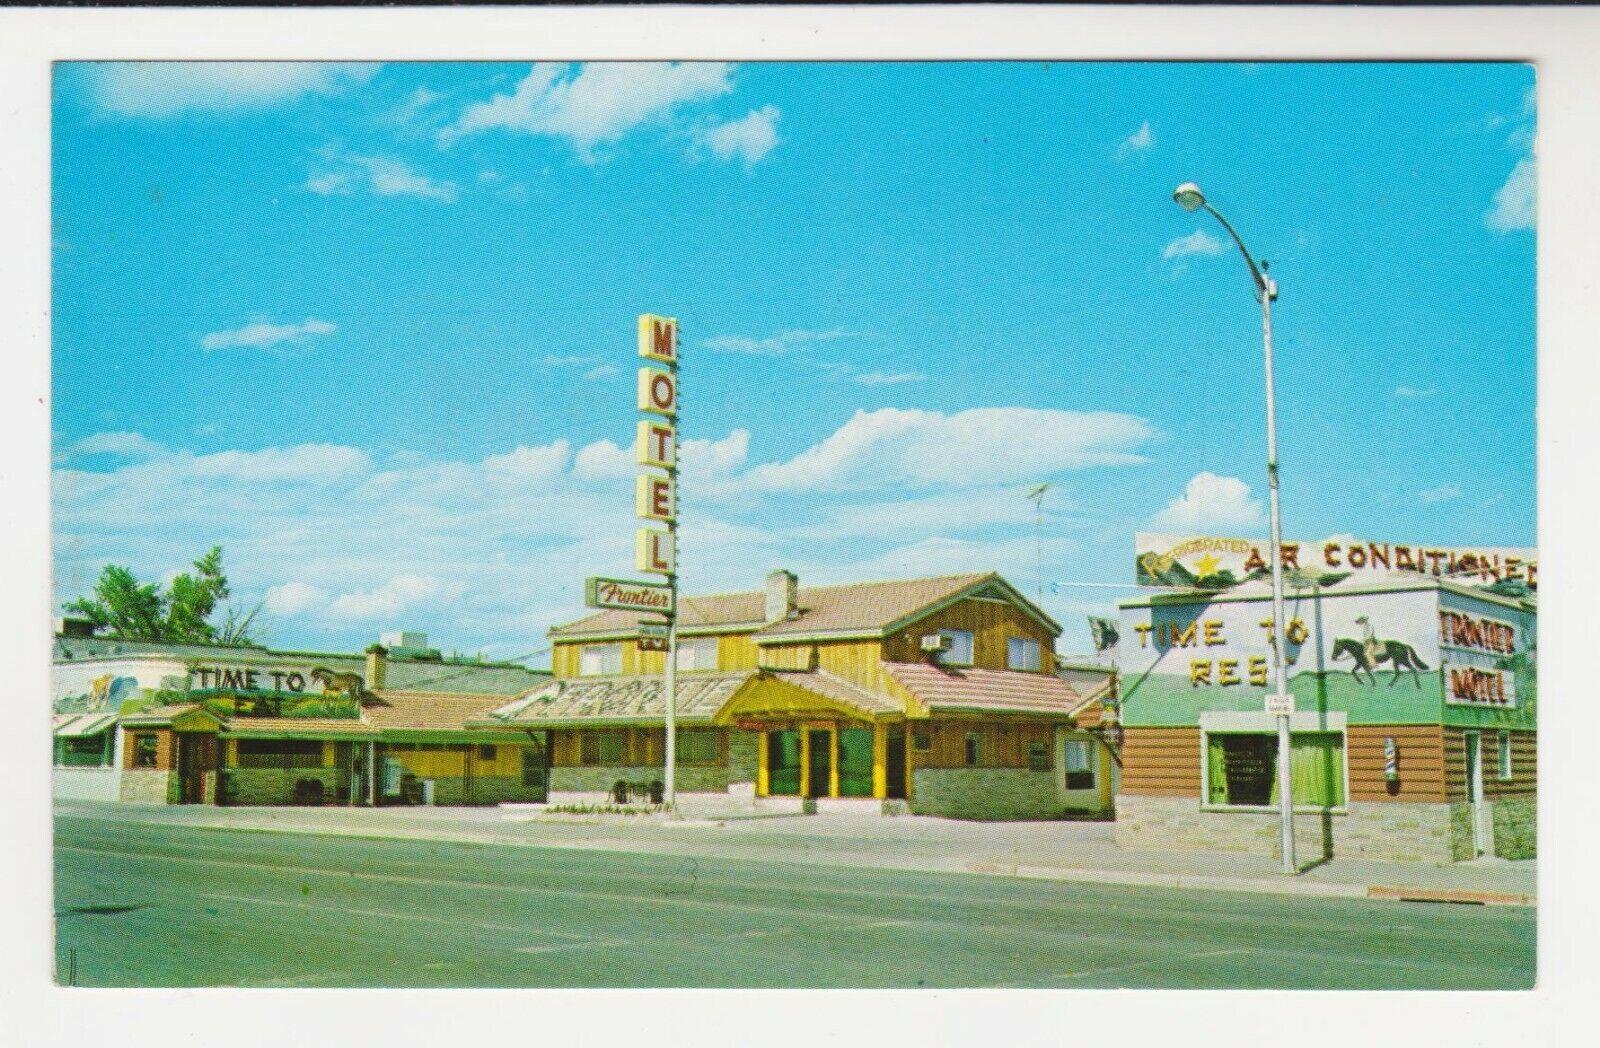 THE FRONTIER MOTEL GRILL - ROOSEVELT, UTAH On U.S. 40 C. 1950s Postcard - $2.00